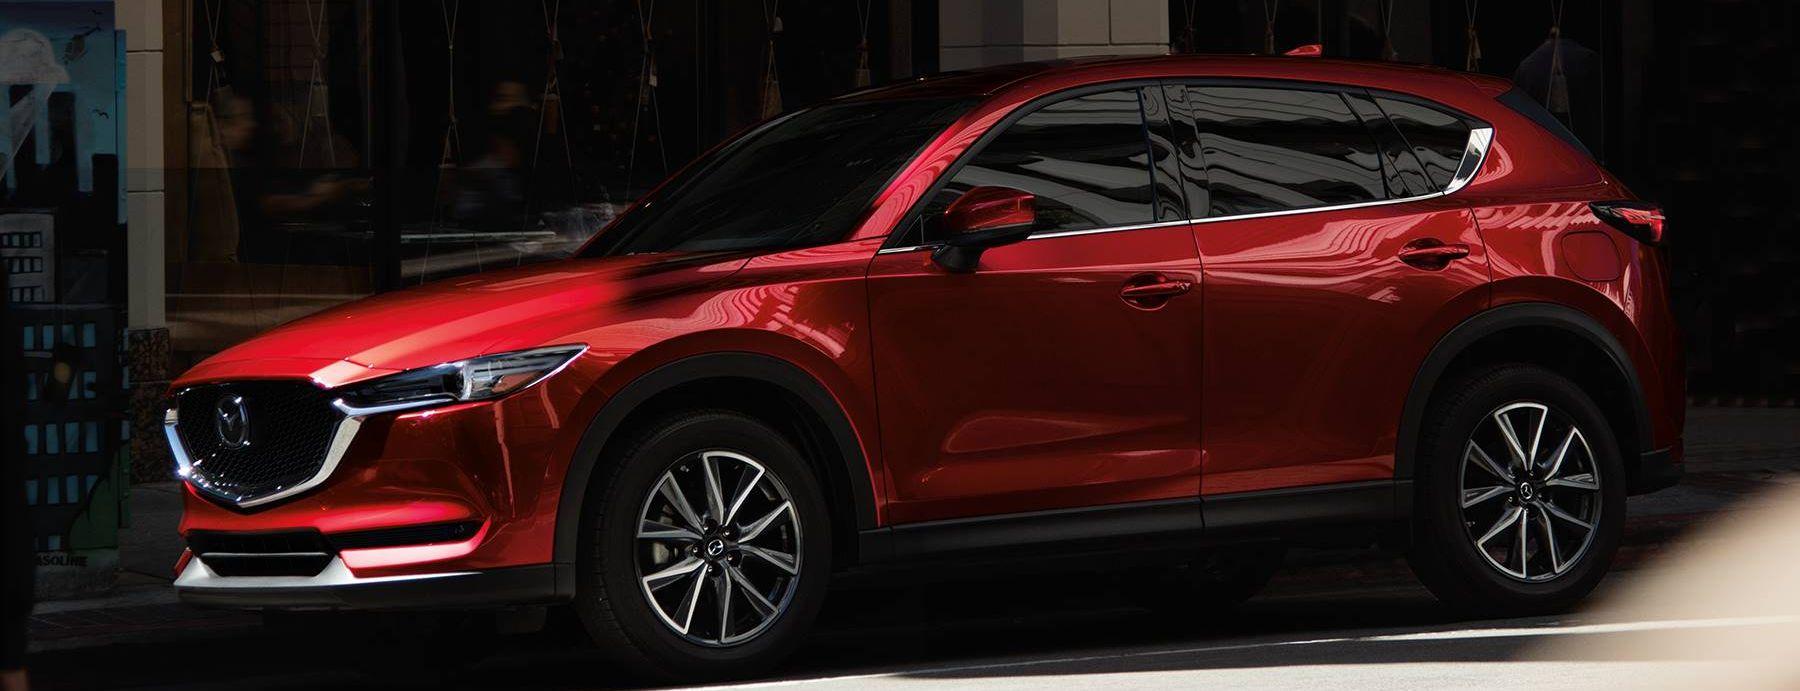 2018 Mazda CX-5 for Sale near Dickinson, TX